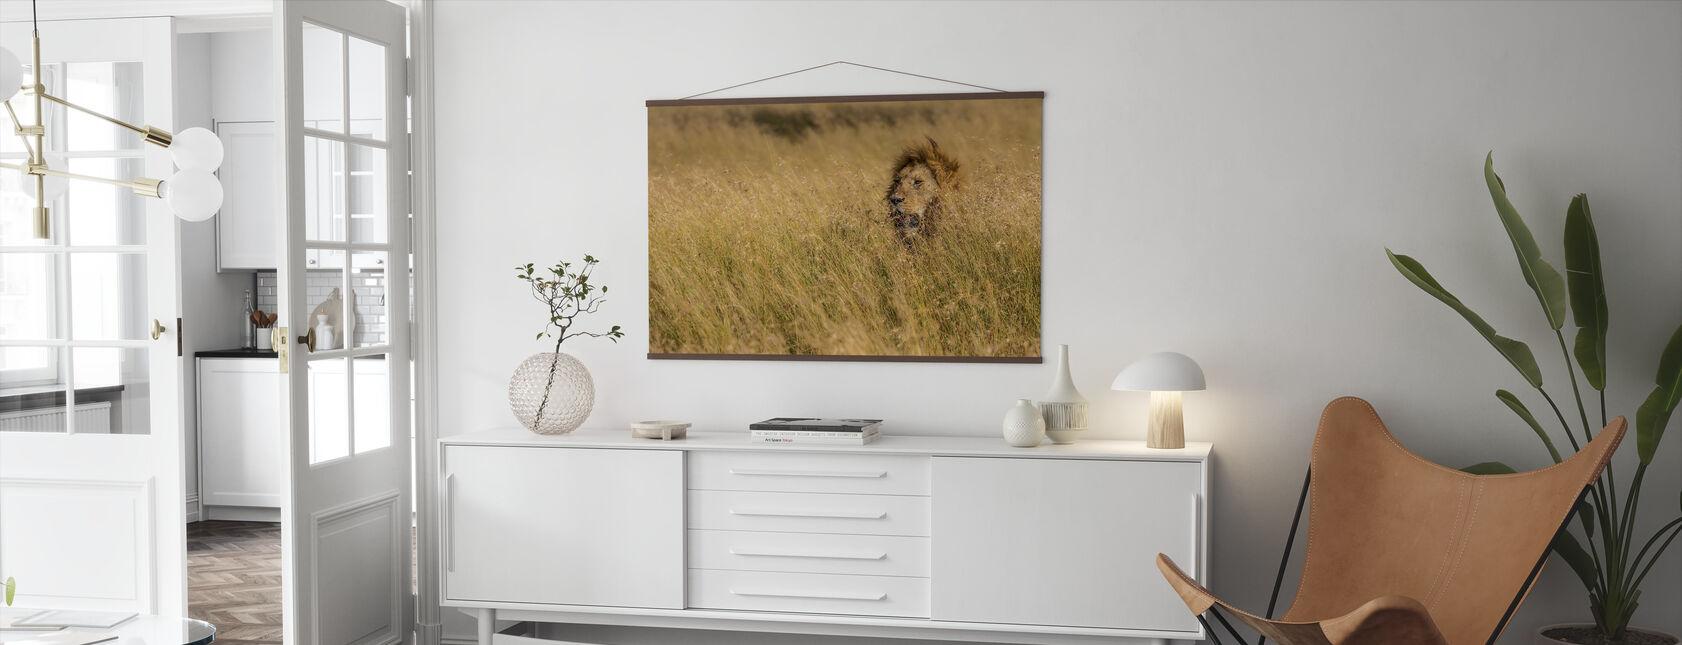 King - Poster - Living Room